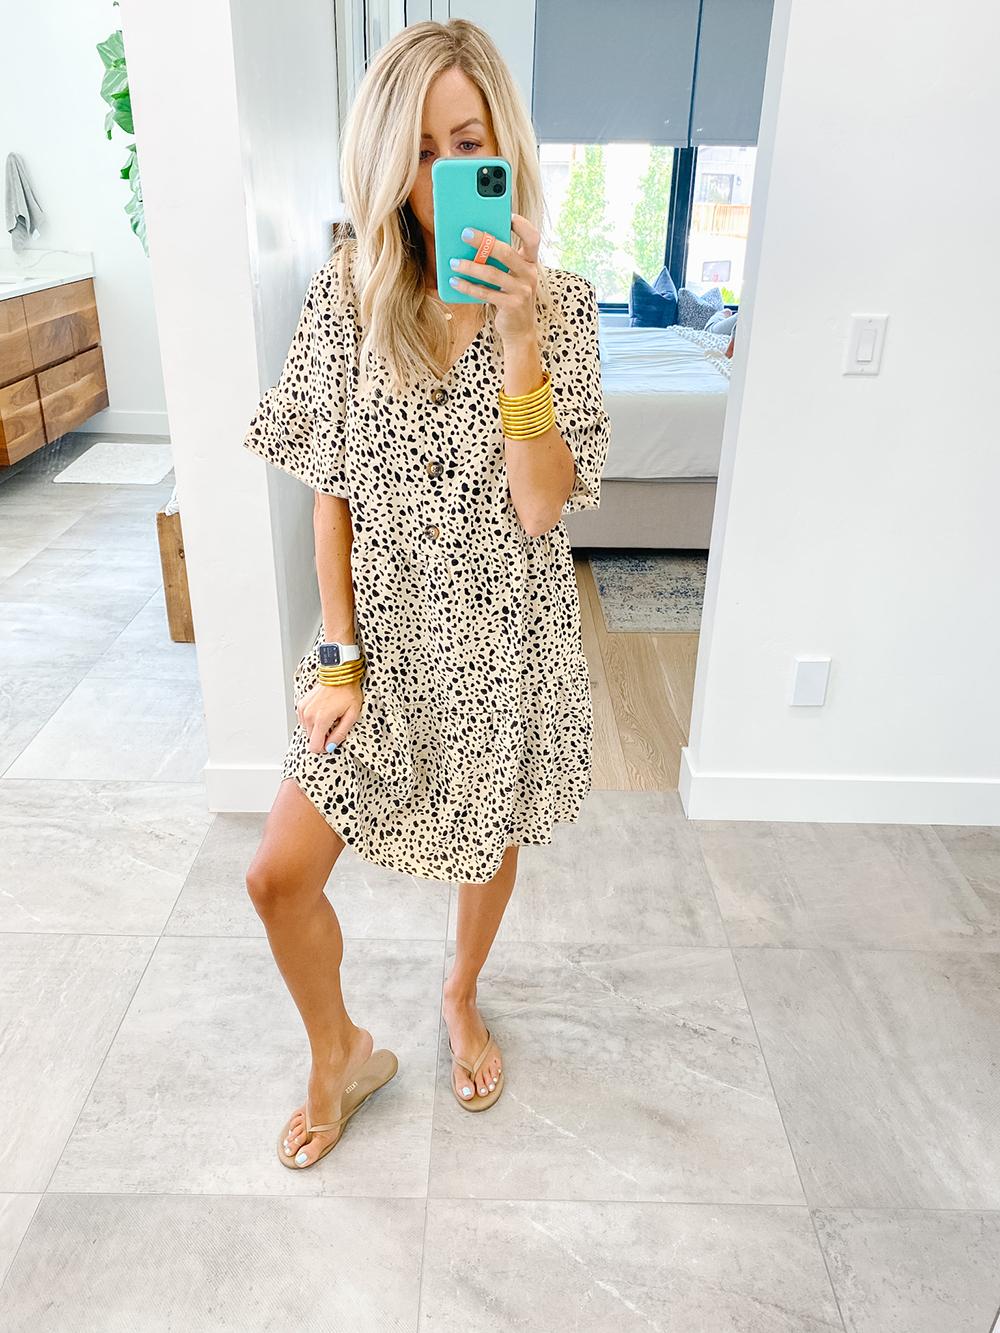 kailee wright amazon leopard dress